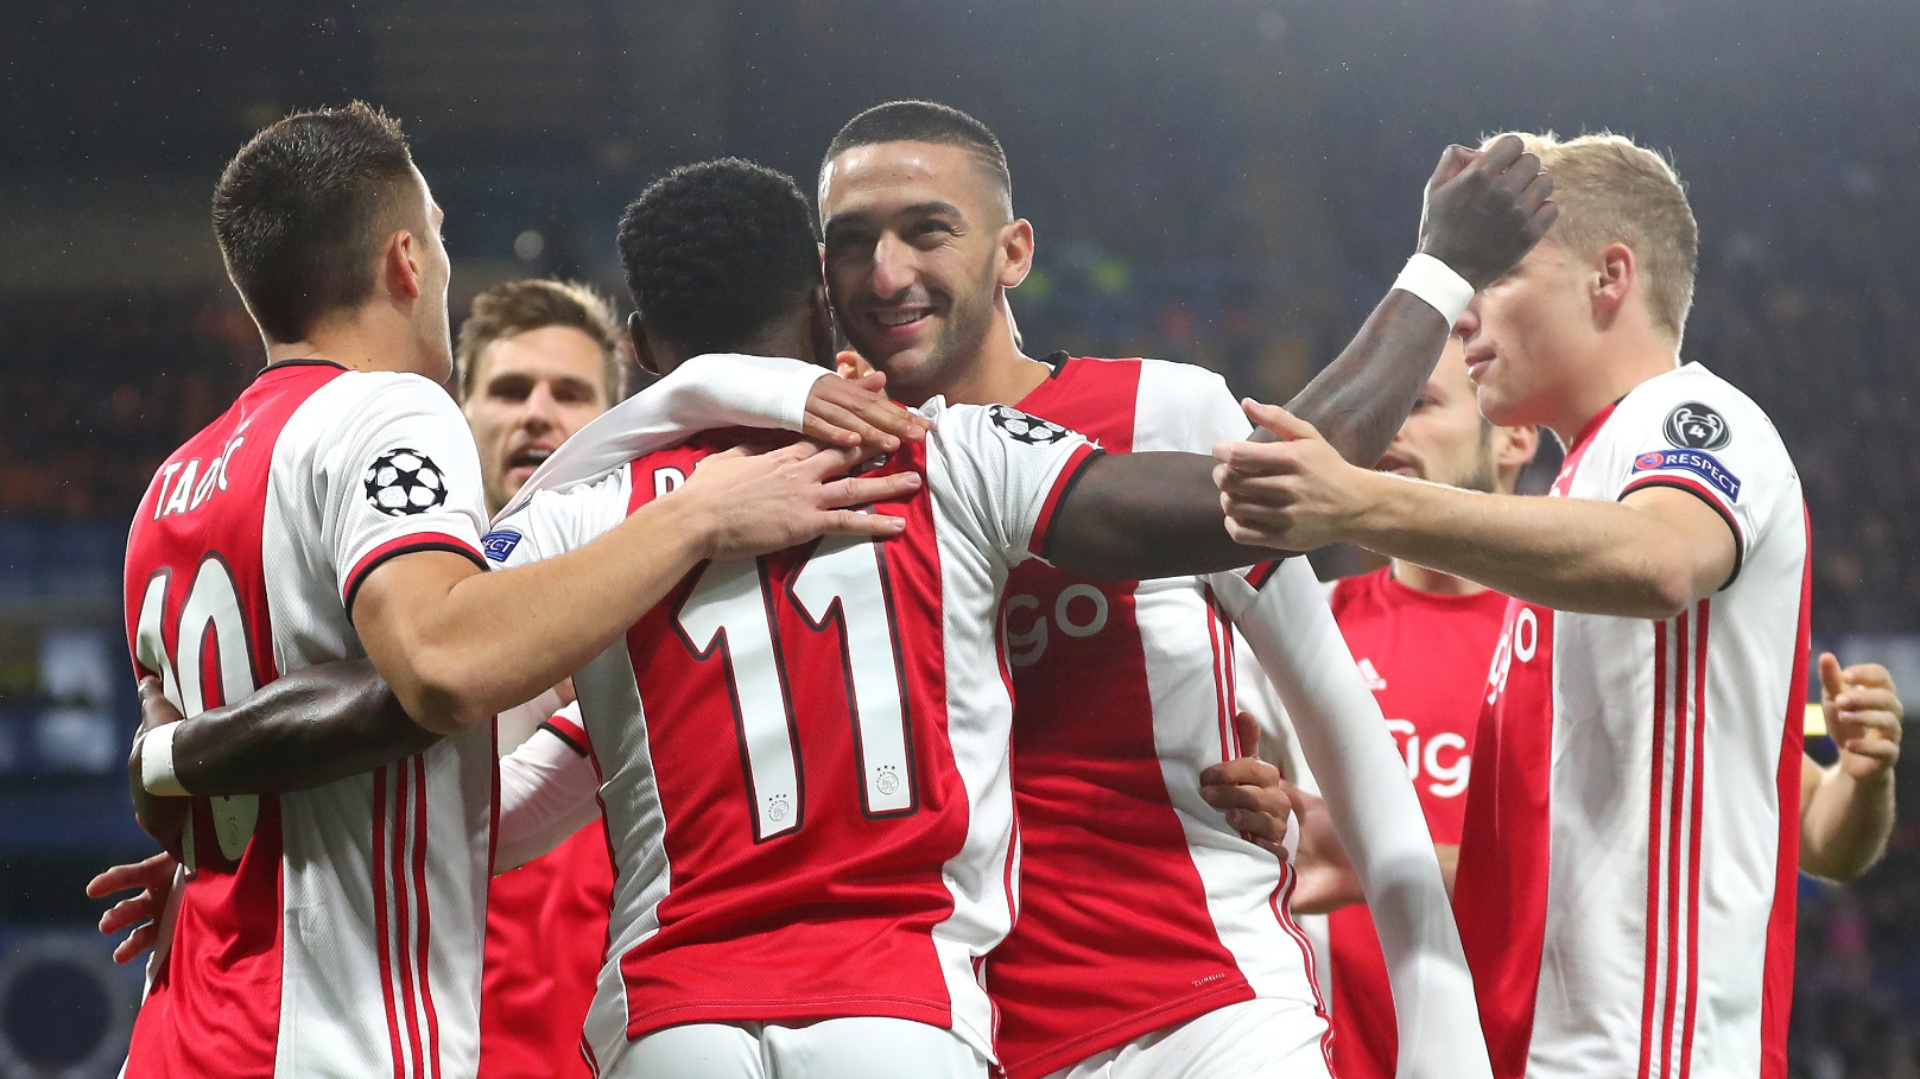 Ziyech plays key role in Ajax demolition of Utrecht